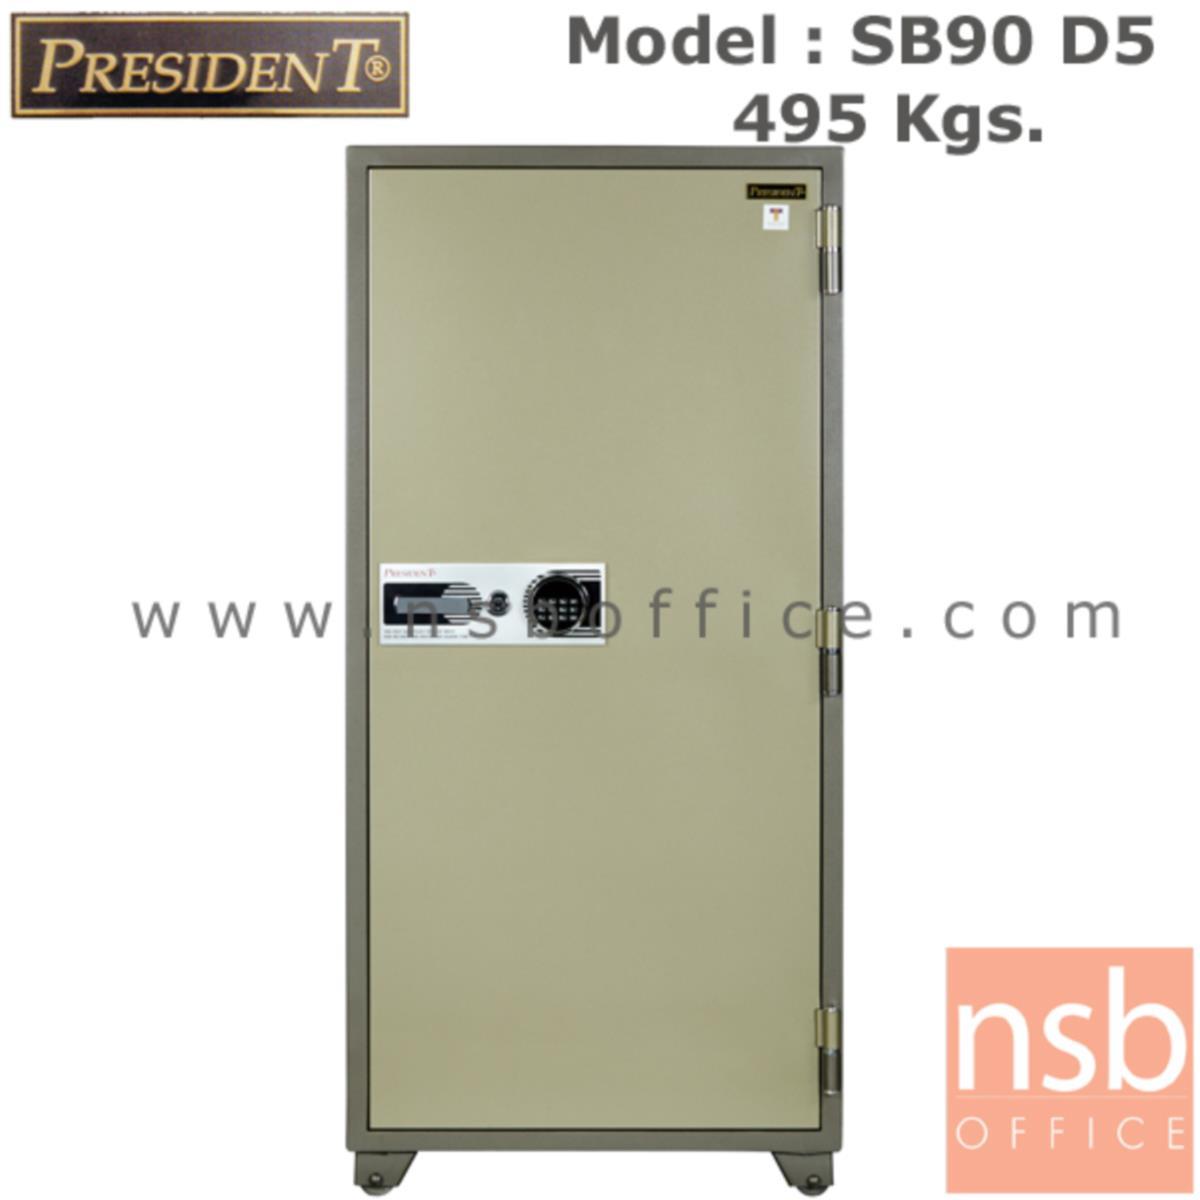 F05A067: ตู้เซฟนิรภัยชนิดดิจิตอลแบบใหม่ 495 กก.  รุ่น PRESIDENT-SB90D มี 1 กุญแจ 1 รหัส (ใช้กดหน้าตู้)